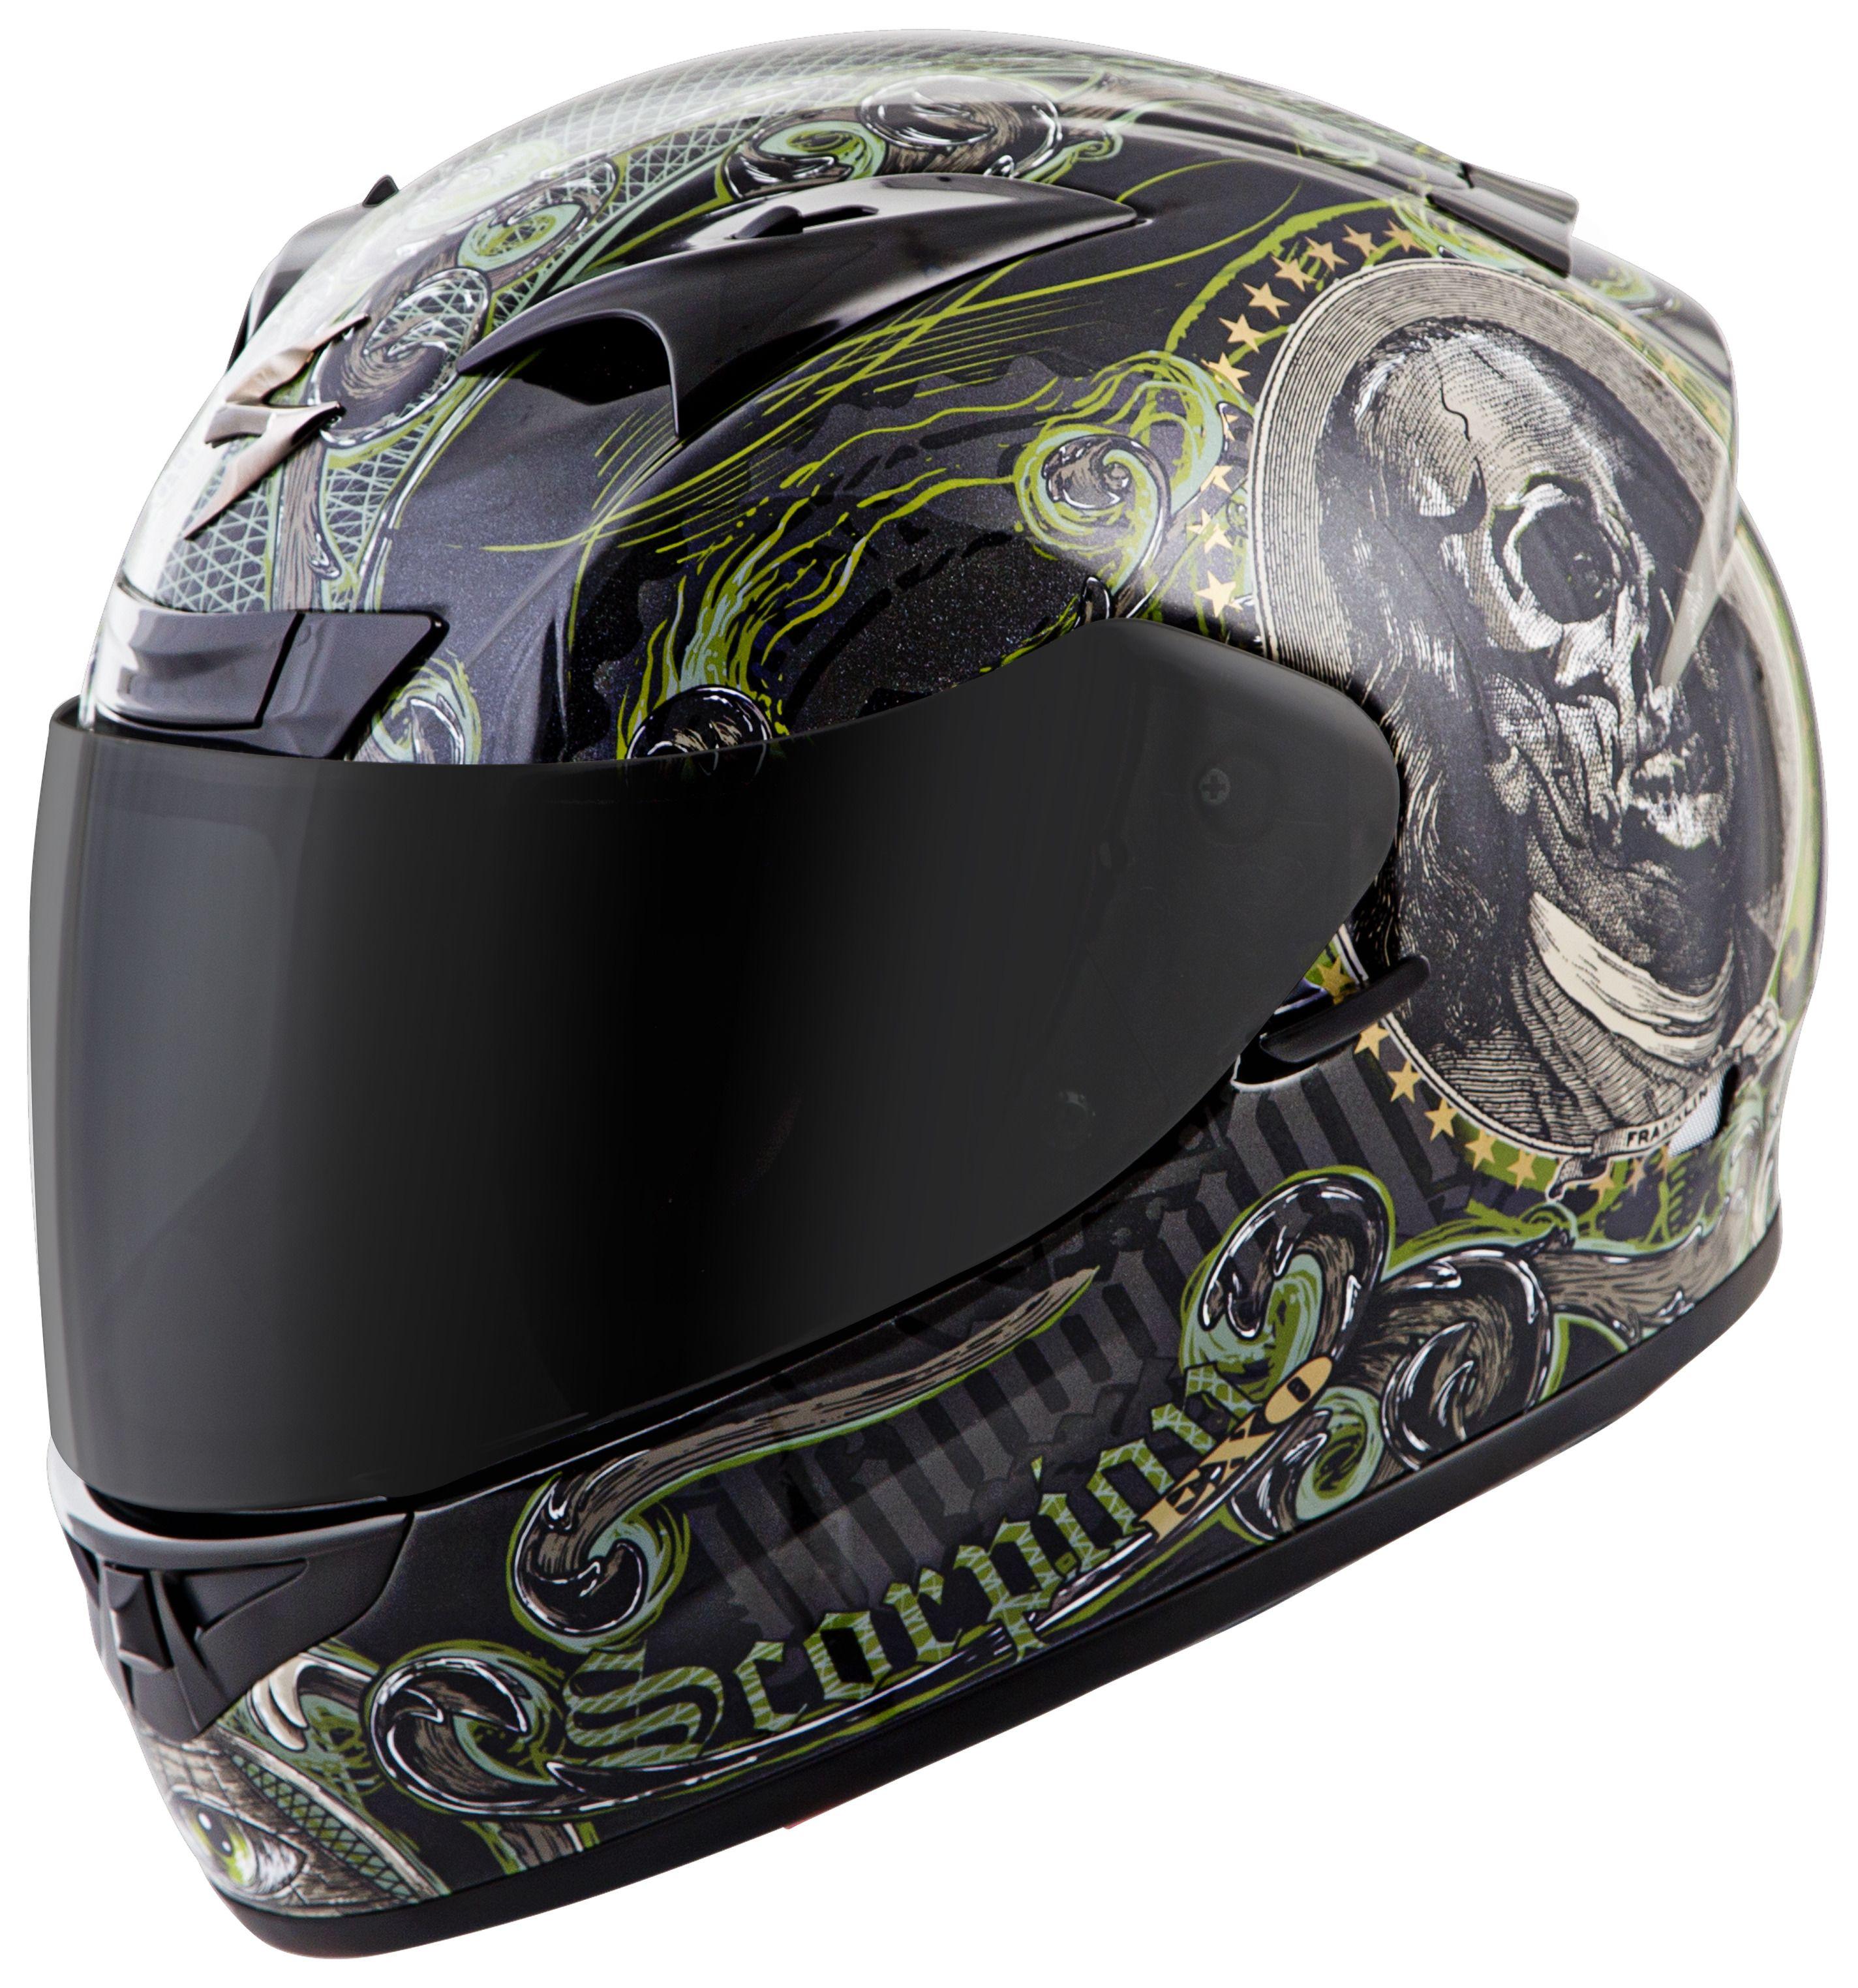 scorpion exo r710 illuminati helmet revzilla. Black Bedroom Furniture Sets. Home Design Ideas